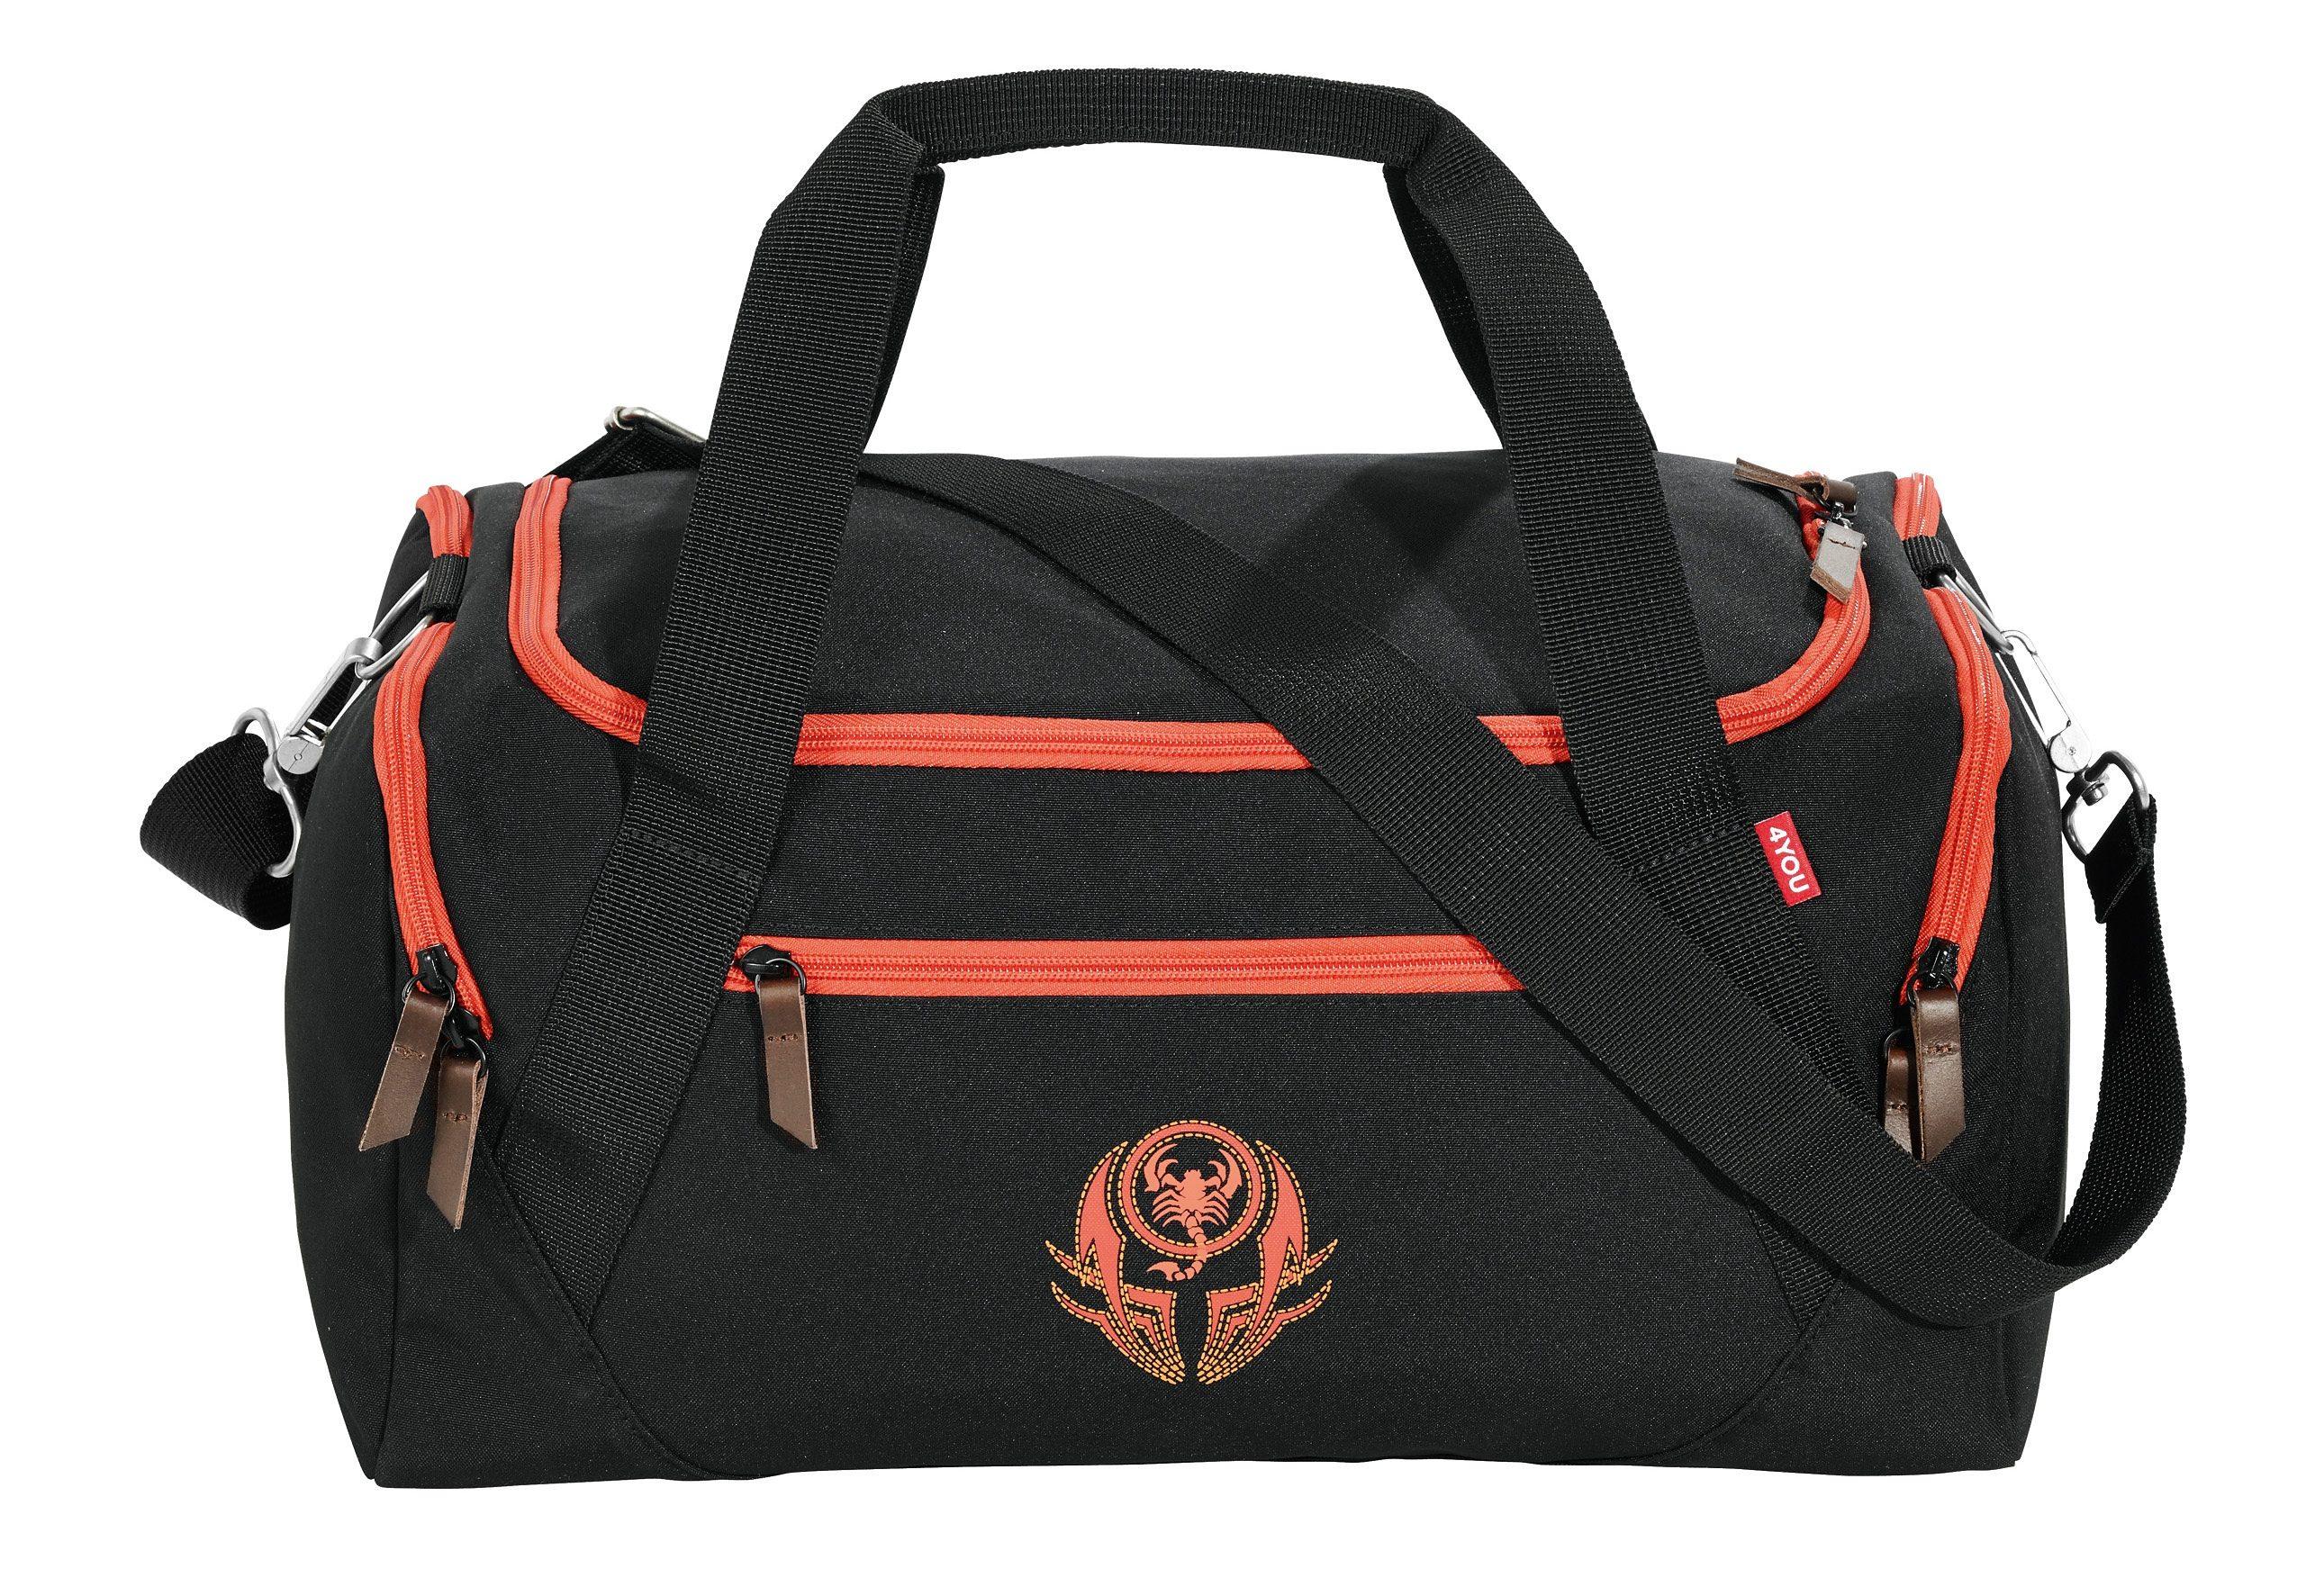 4YOU Sporttasche, Scorpio, »Sportbag«